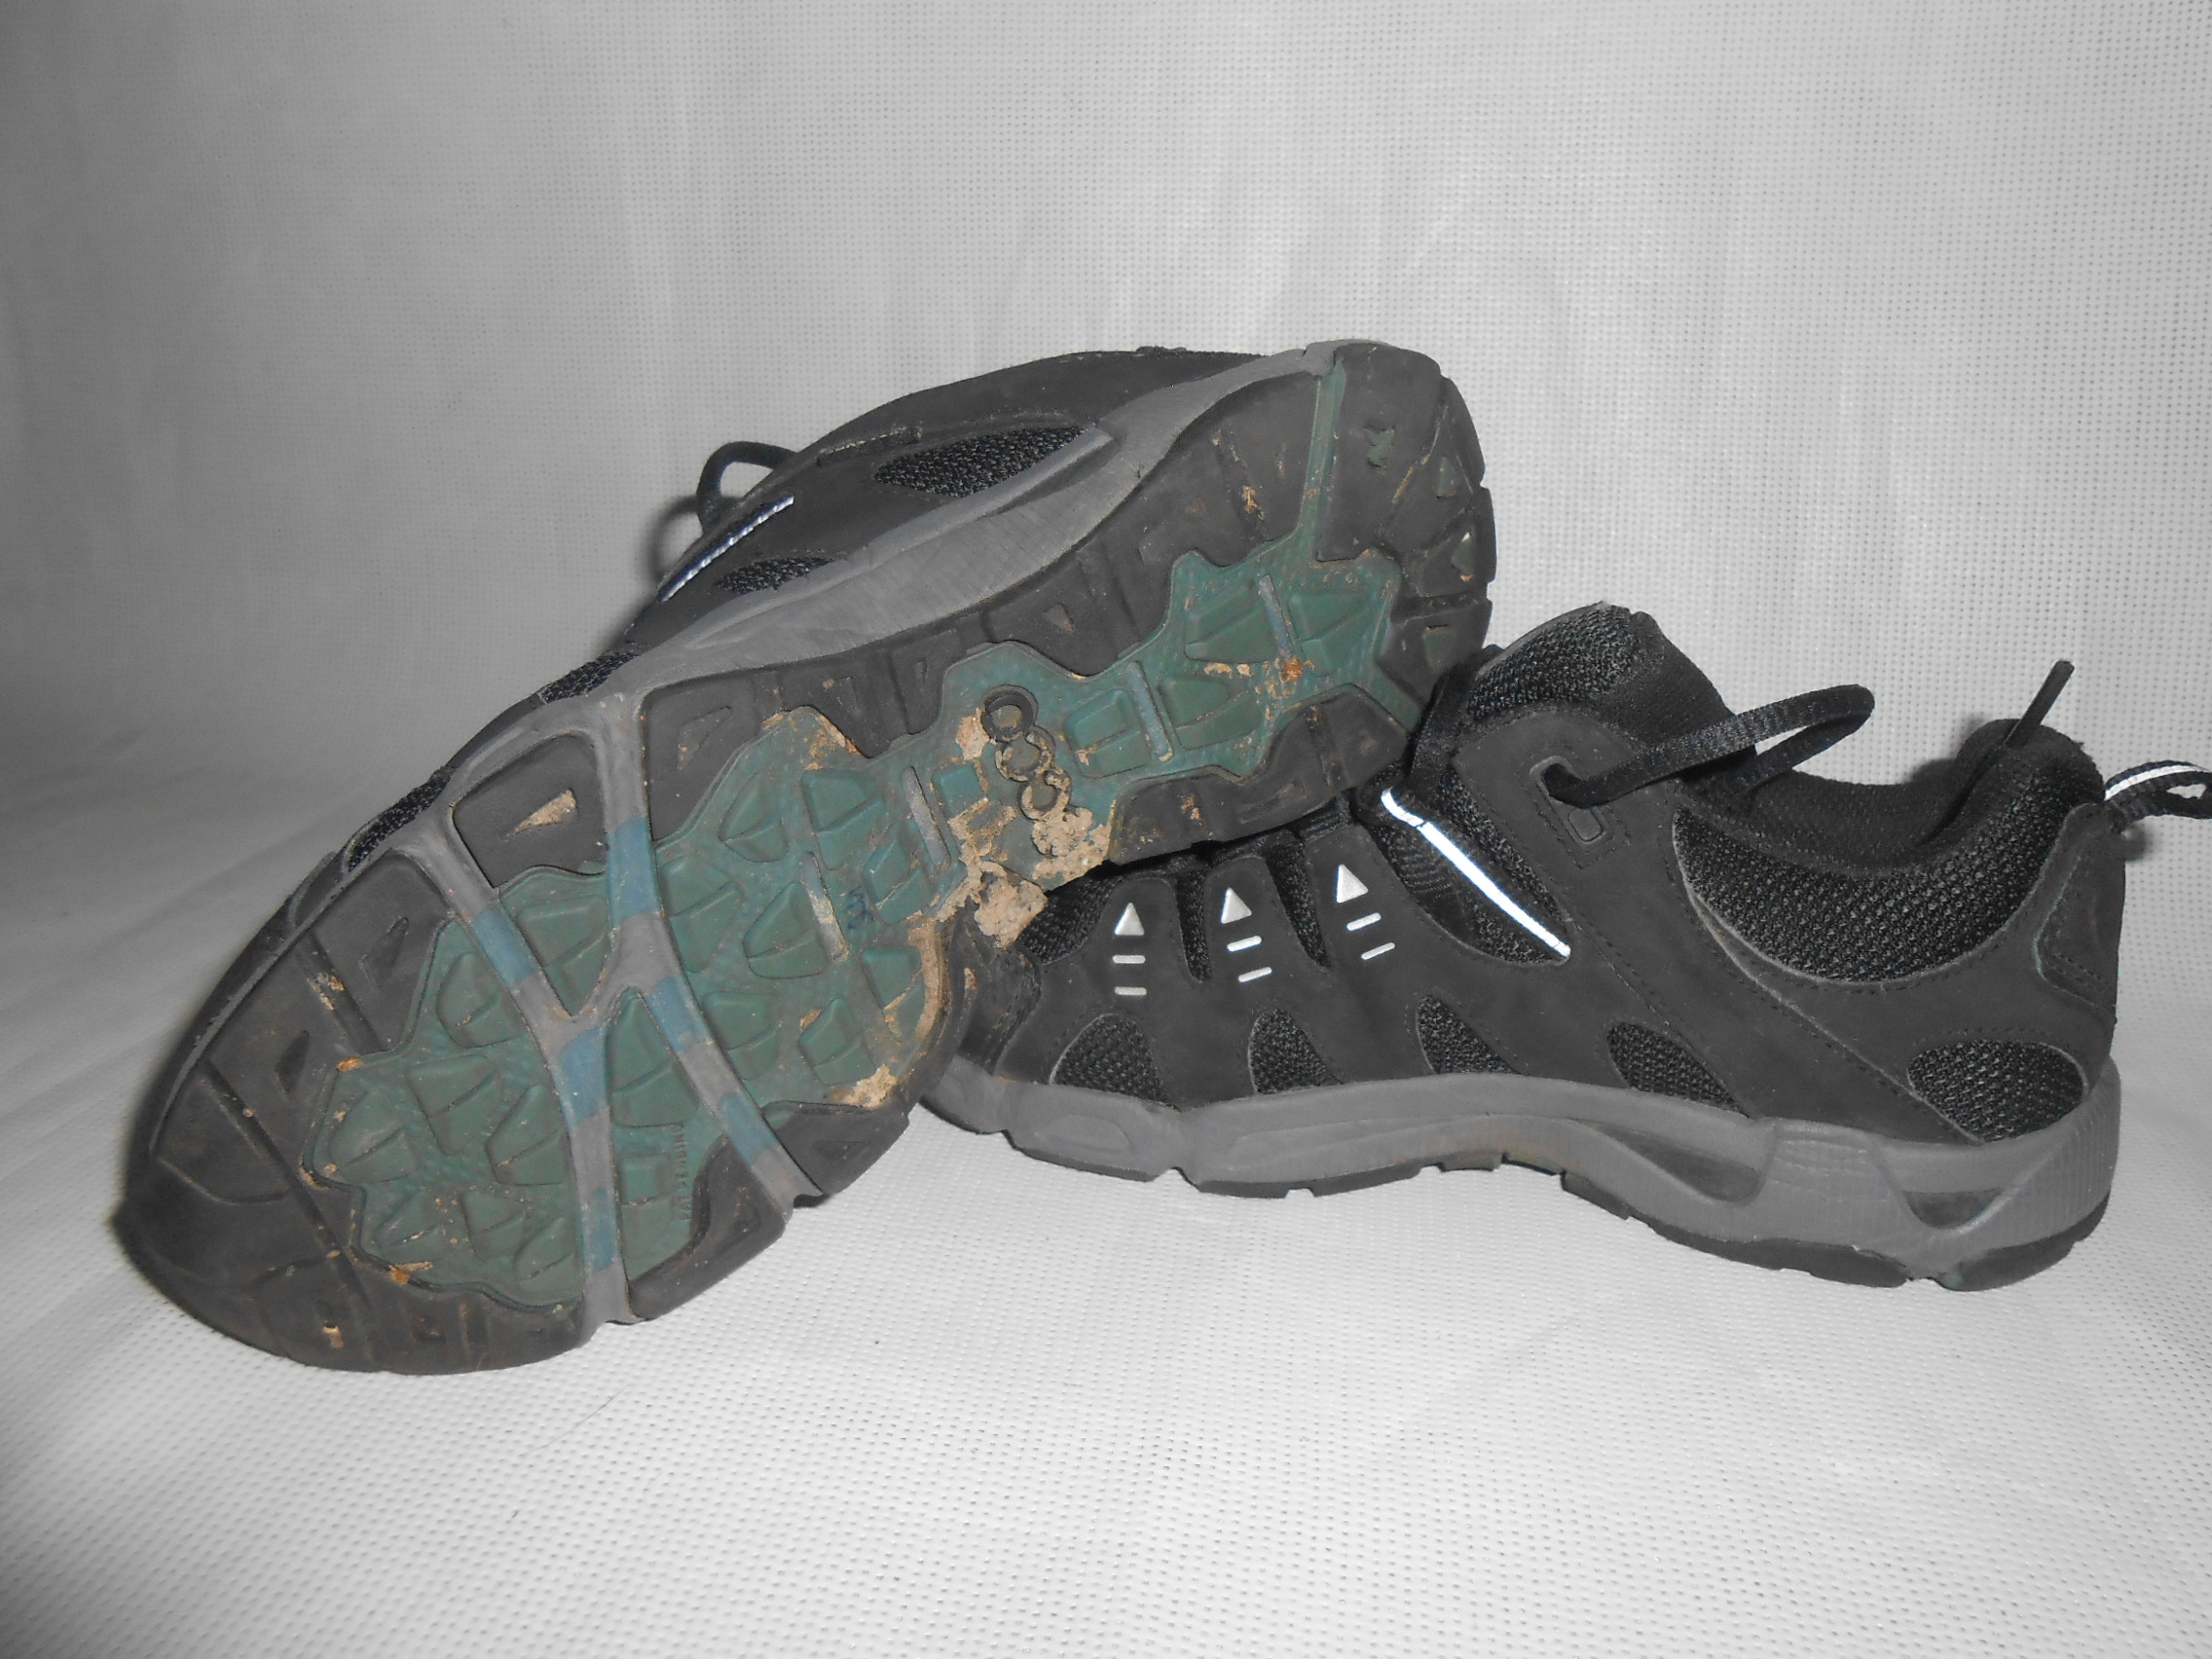 c8ec87e1 Ecco Goretex super buty damskie z Anglii !!nr 36 - 7159951128 ...